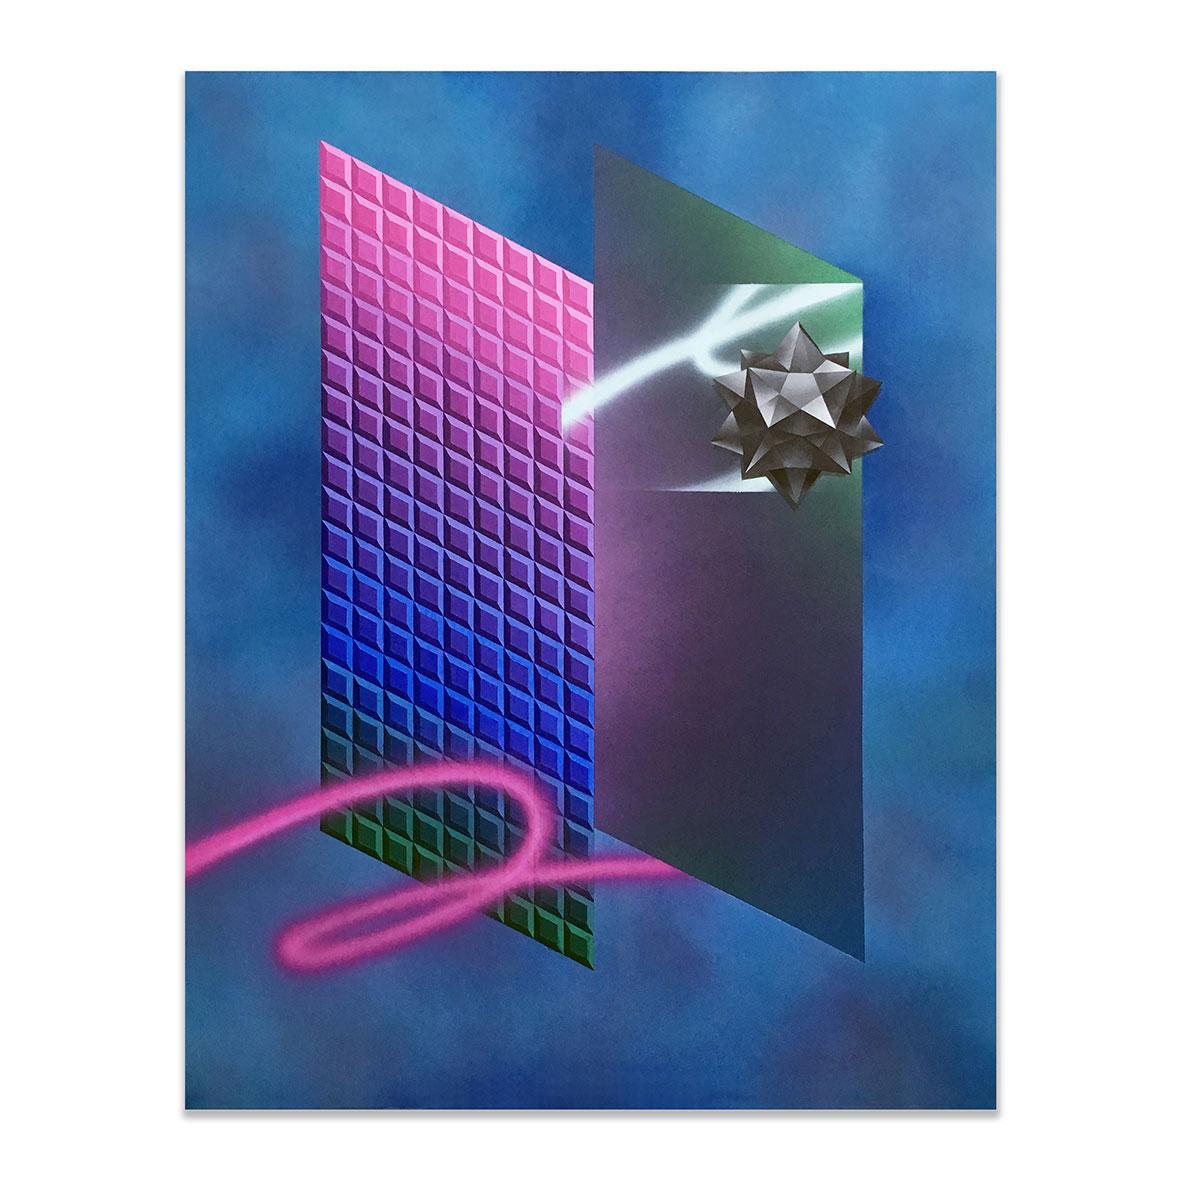 <b>Title:&nbsp;</b>~NMH*NFM~<br /><b>Year:&nbsp;</b>2018<br /><b>Medium:&nbsp;</b>Acrylic on canvas<br /><b>Size:&nbsp;</b>120cm x 150cm